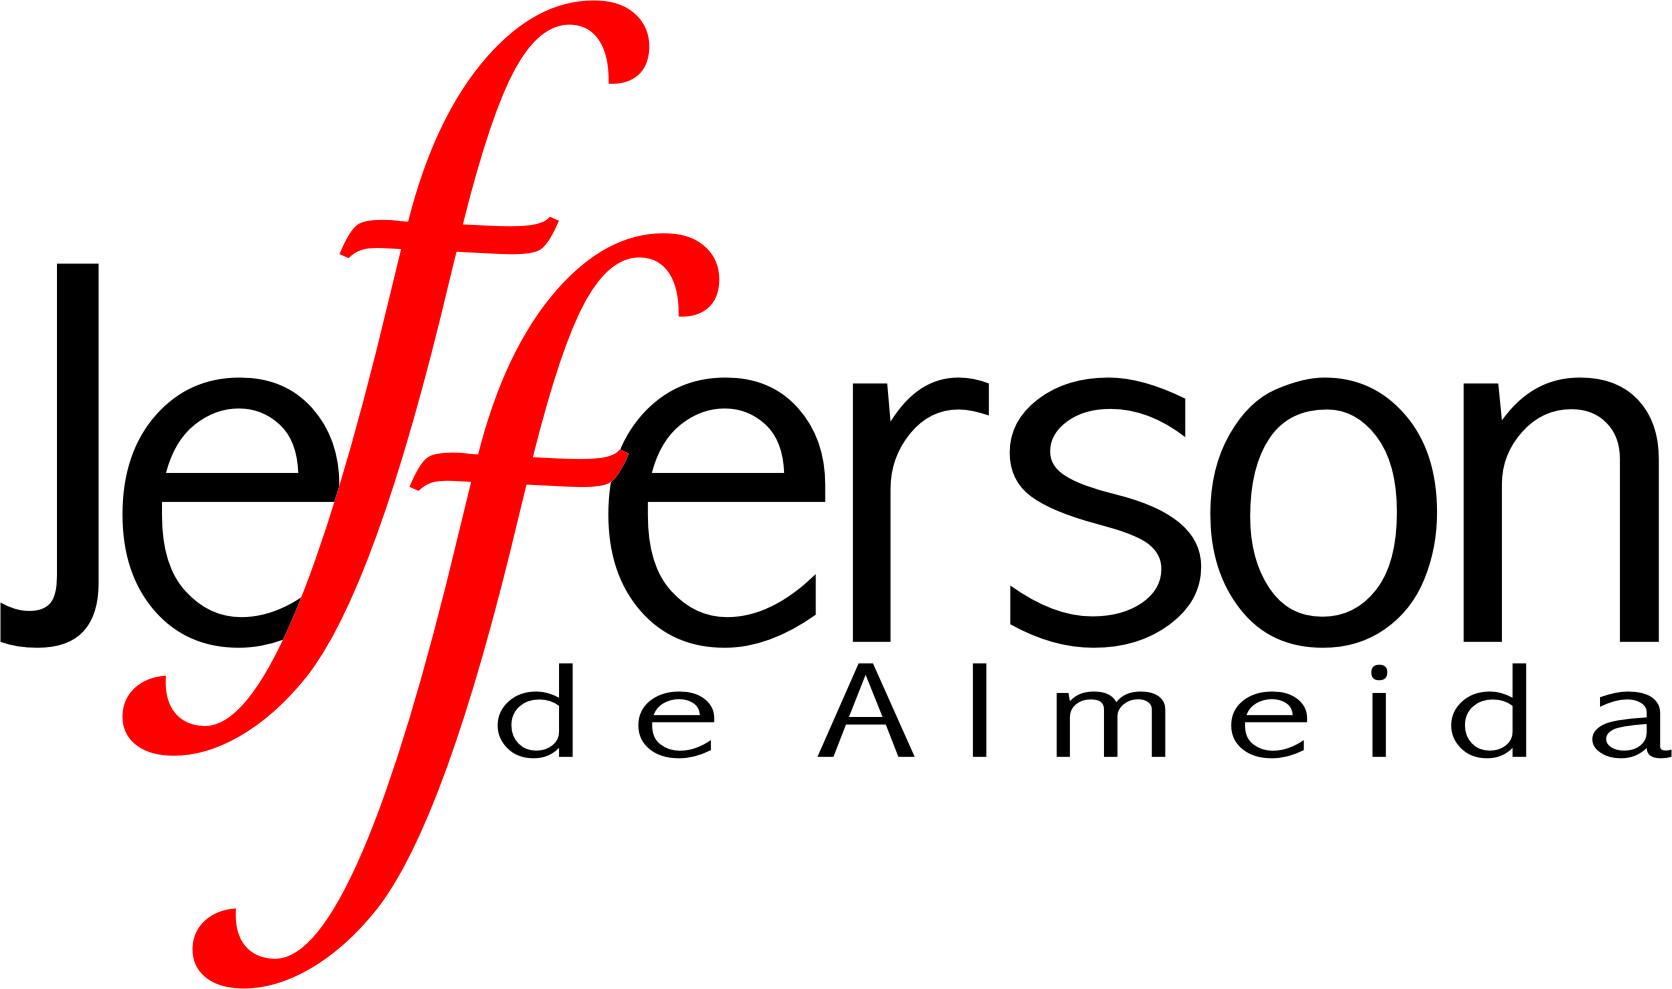 Jefferson de Almeida